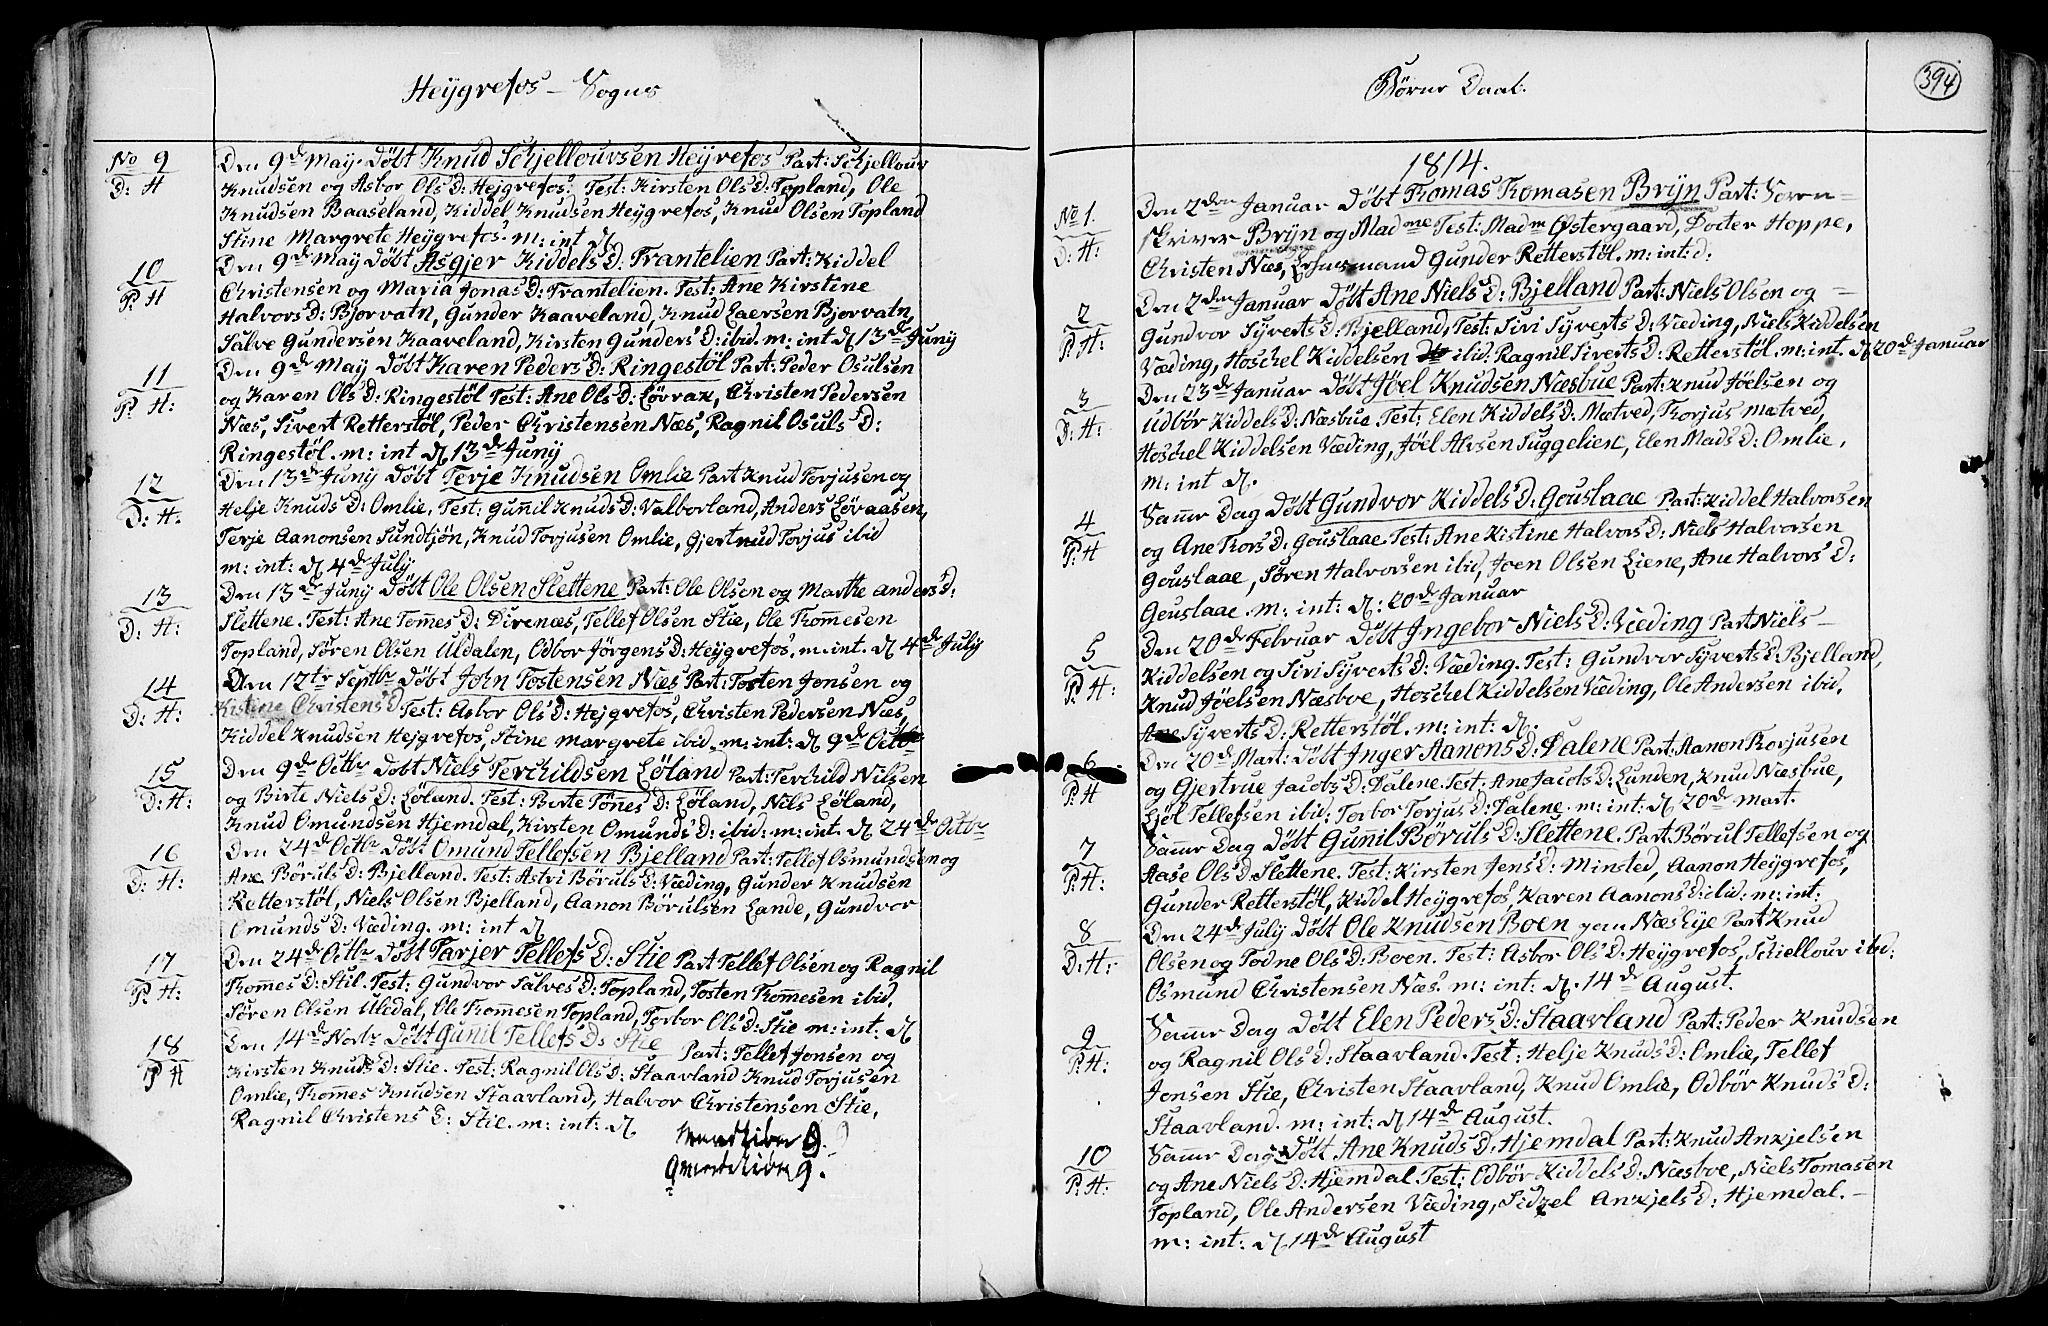 SAK, Hommedal sokneprestkontor, F/Fa/Fab/L0002: Ministerialbok nr. A 2 /3, 1740-1821, s. 394